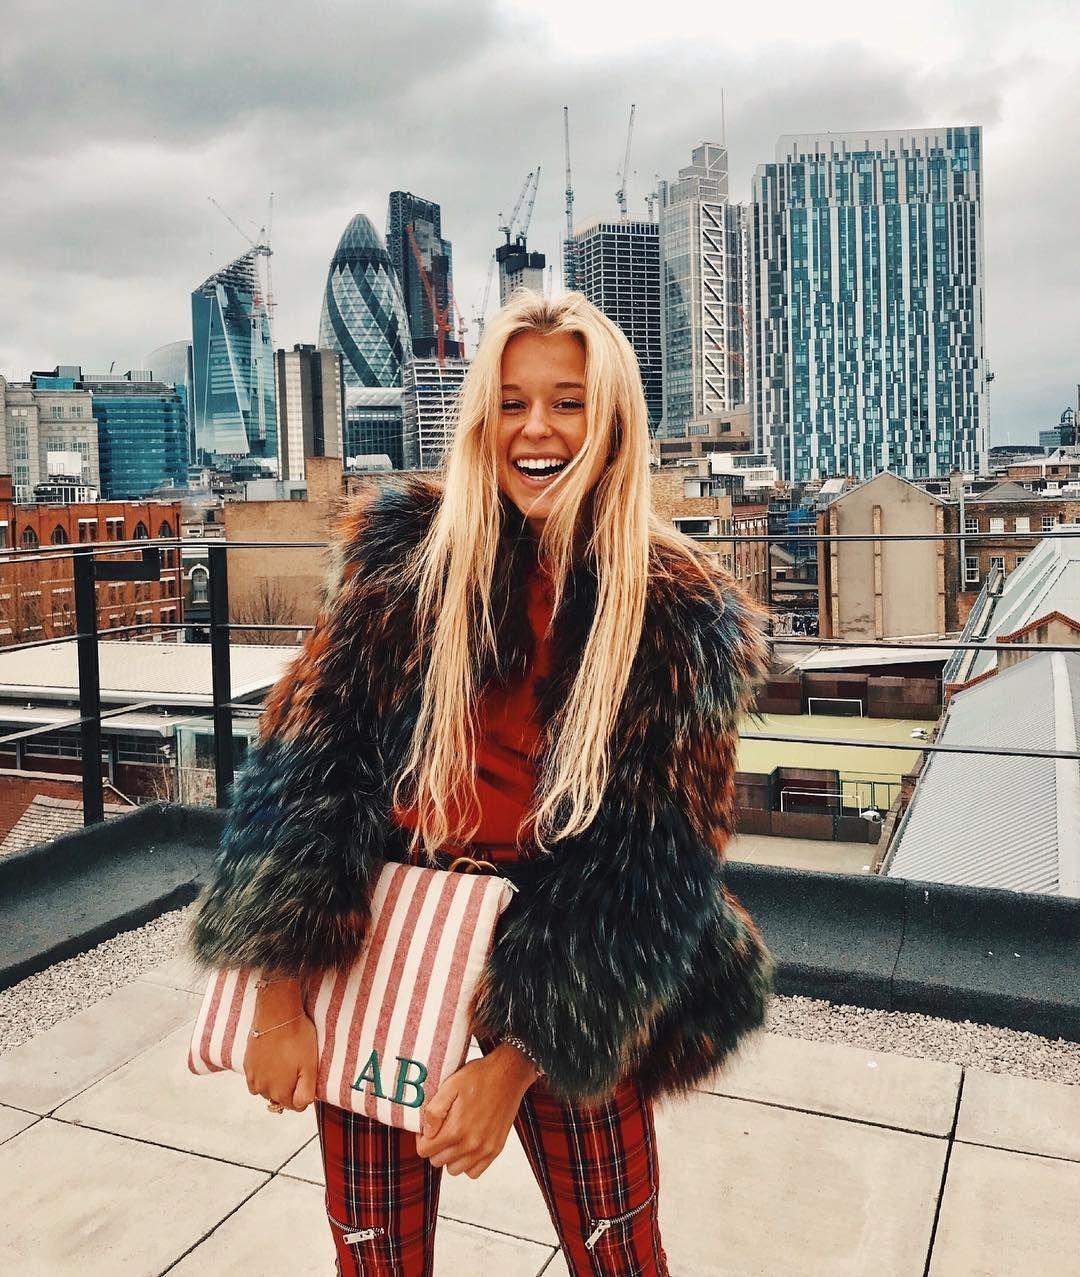 Andrea Thompson Hot pincloe thompson on andrea belver in 2019 | fashion, fur